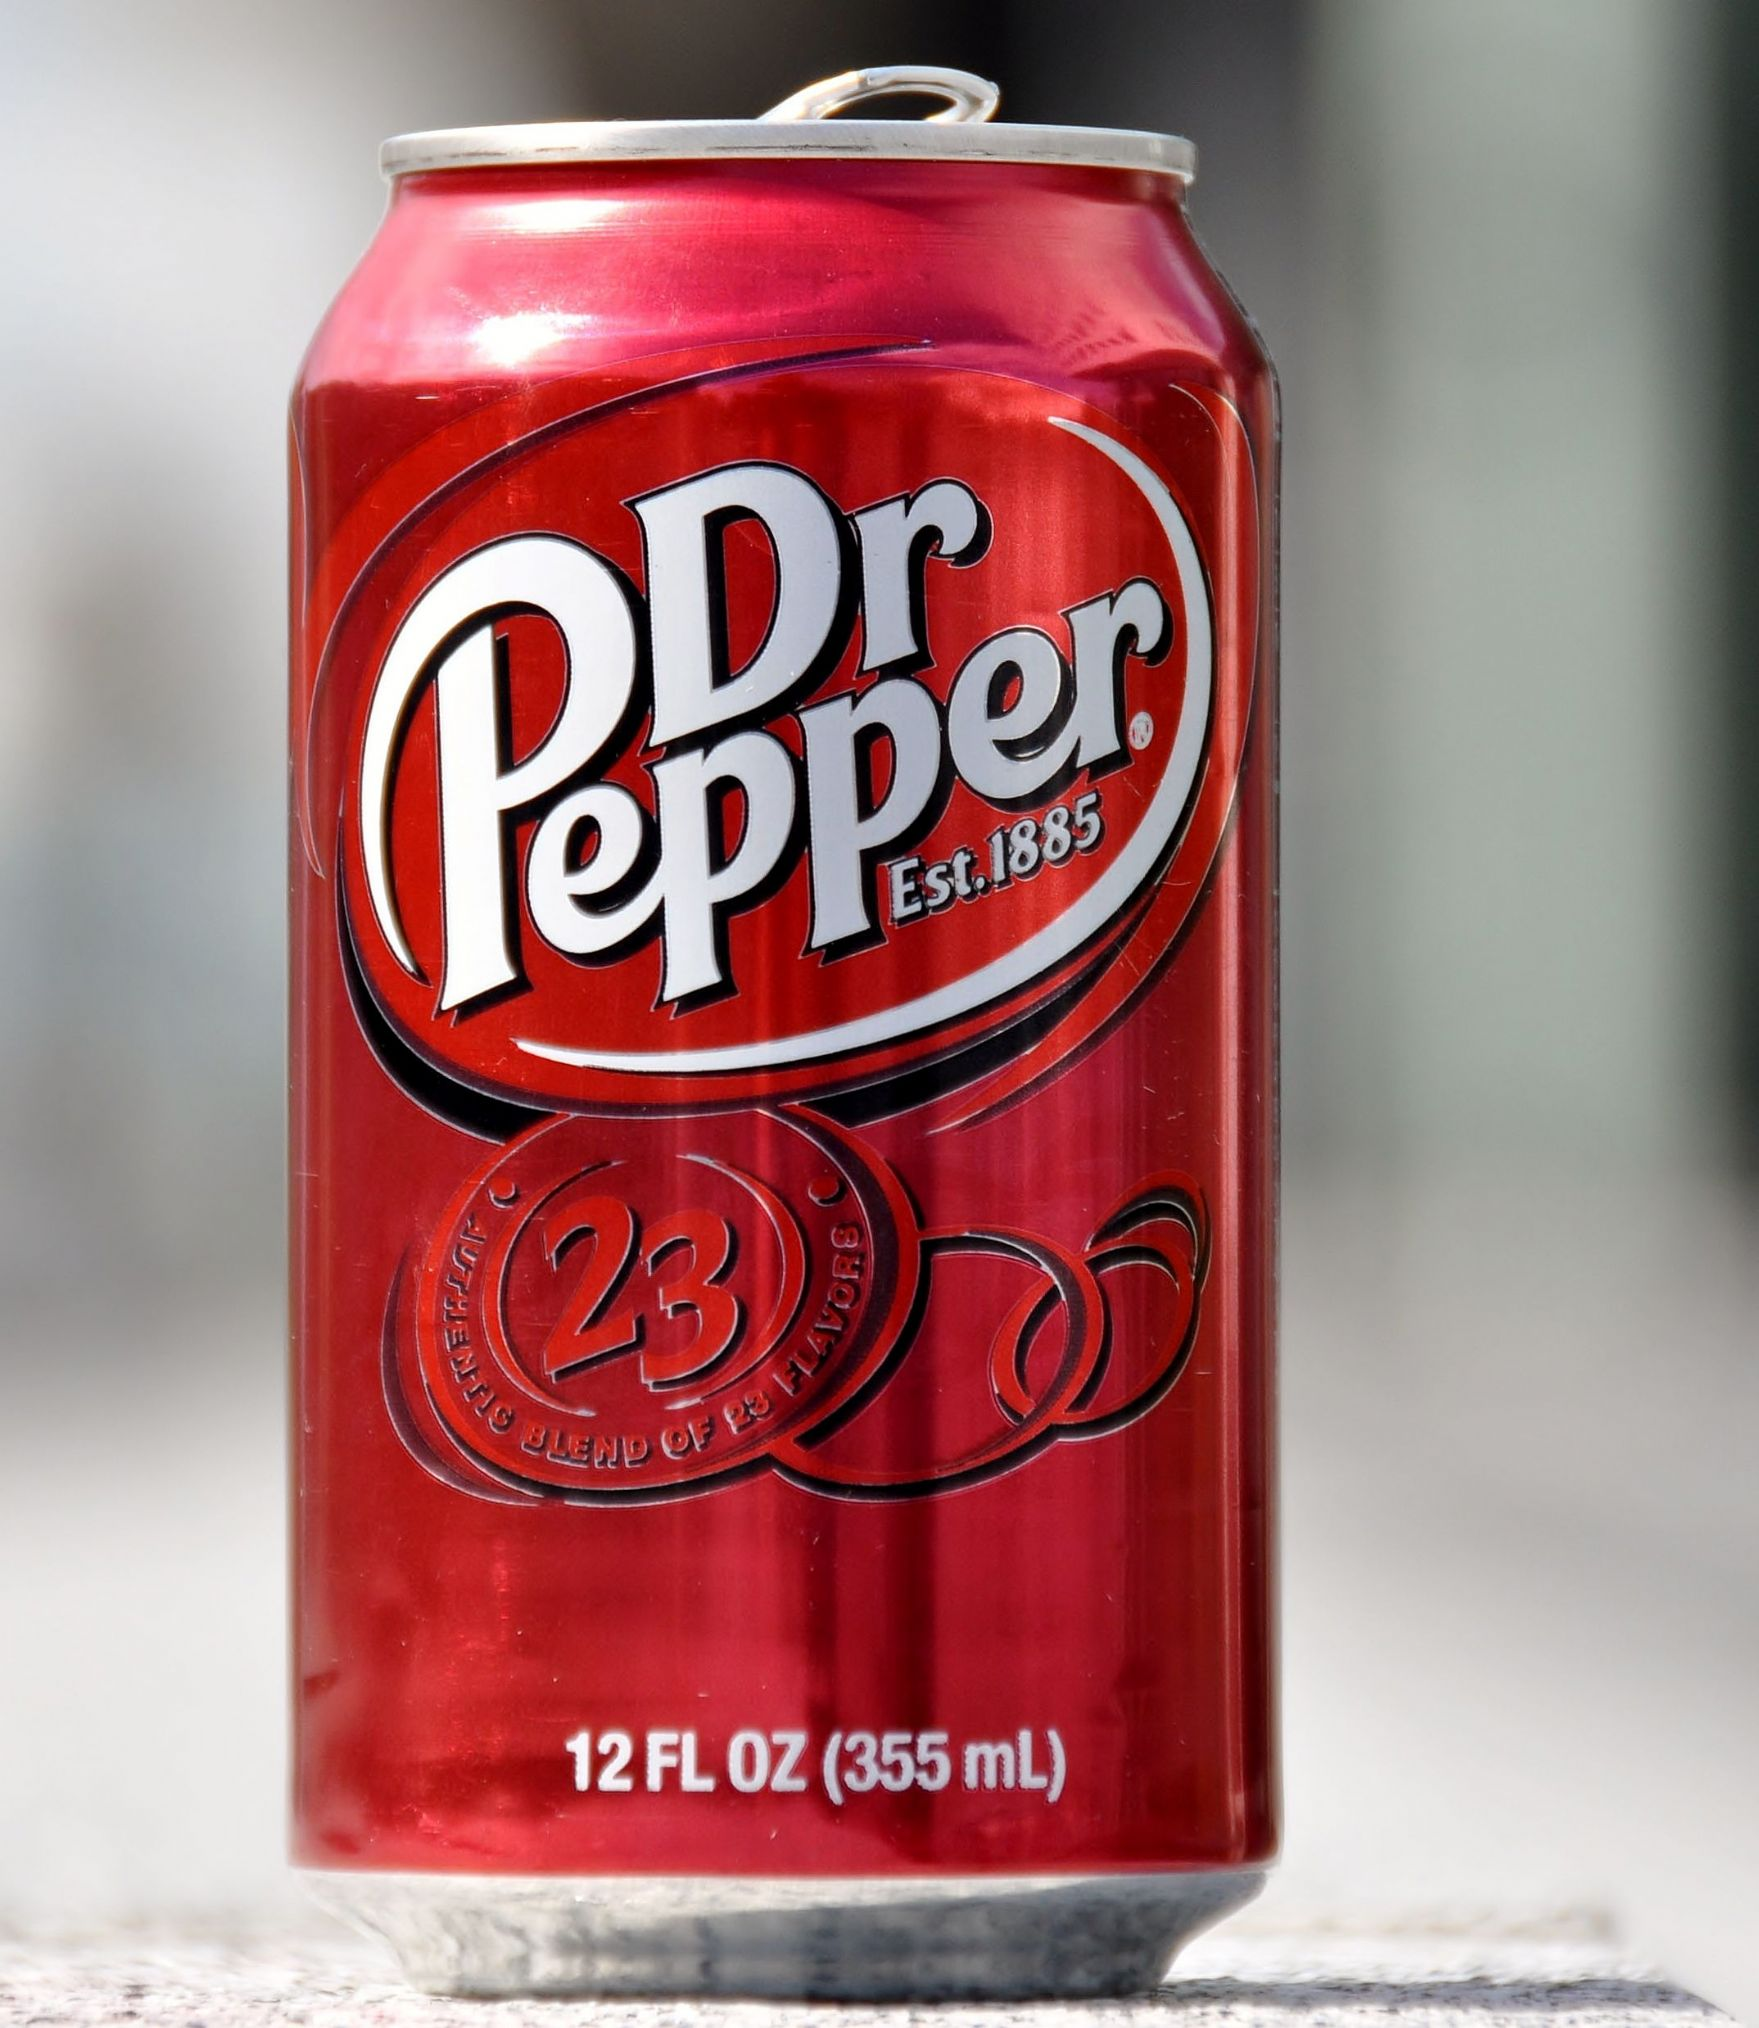 american-original-dr-pepper-soda-case-of-12-cans-dated-17-11-14-[2]-11595-p